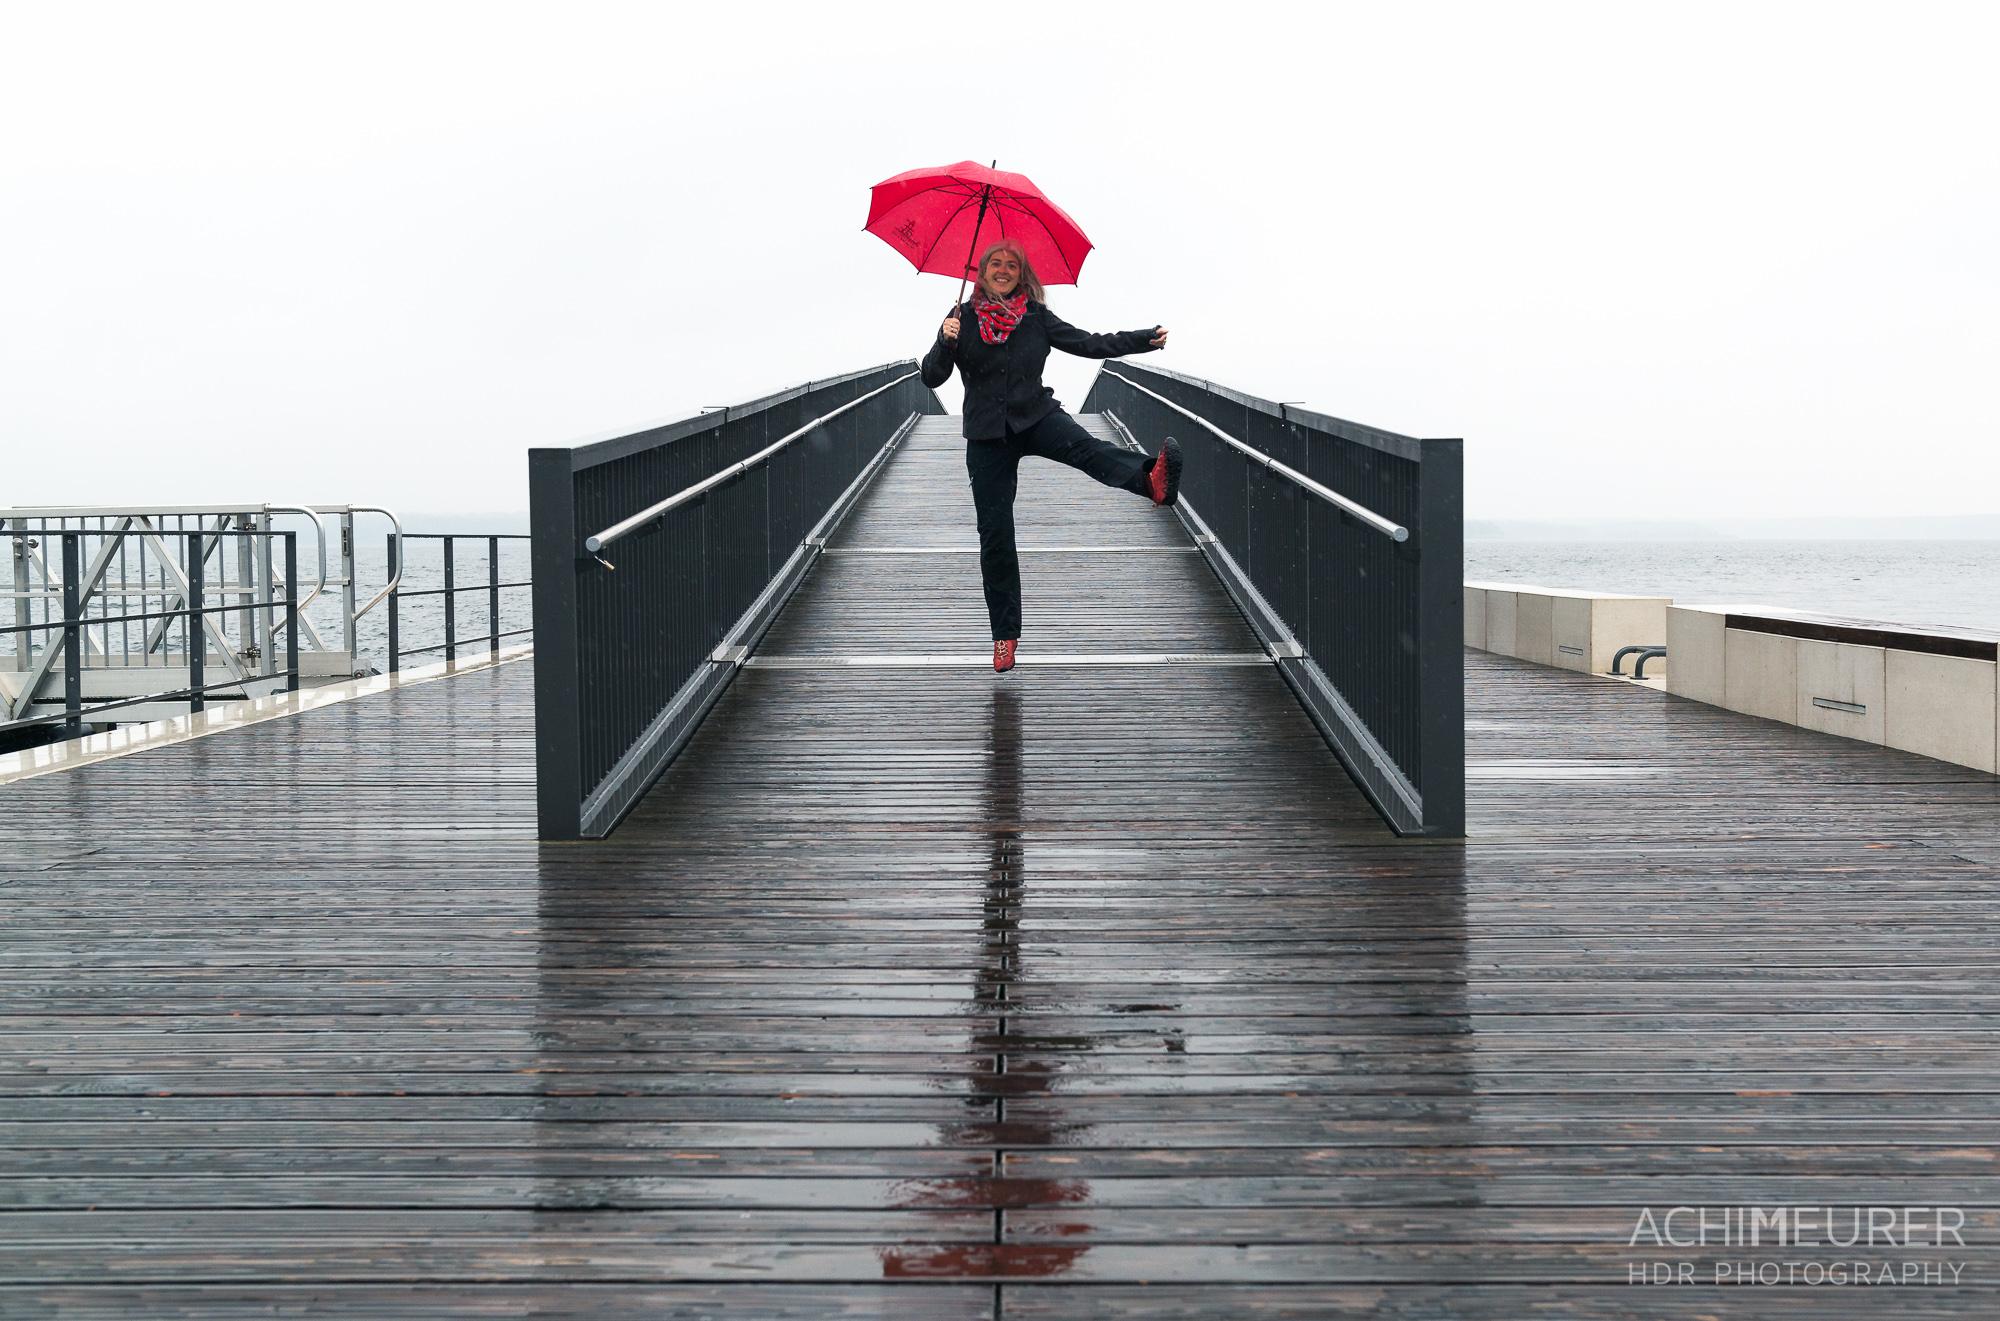 Dancing in the rain - Spaziergang im Regen im Lausitzer Seenland